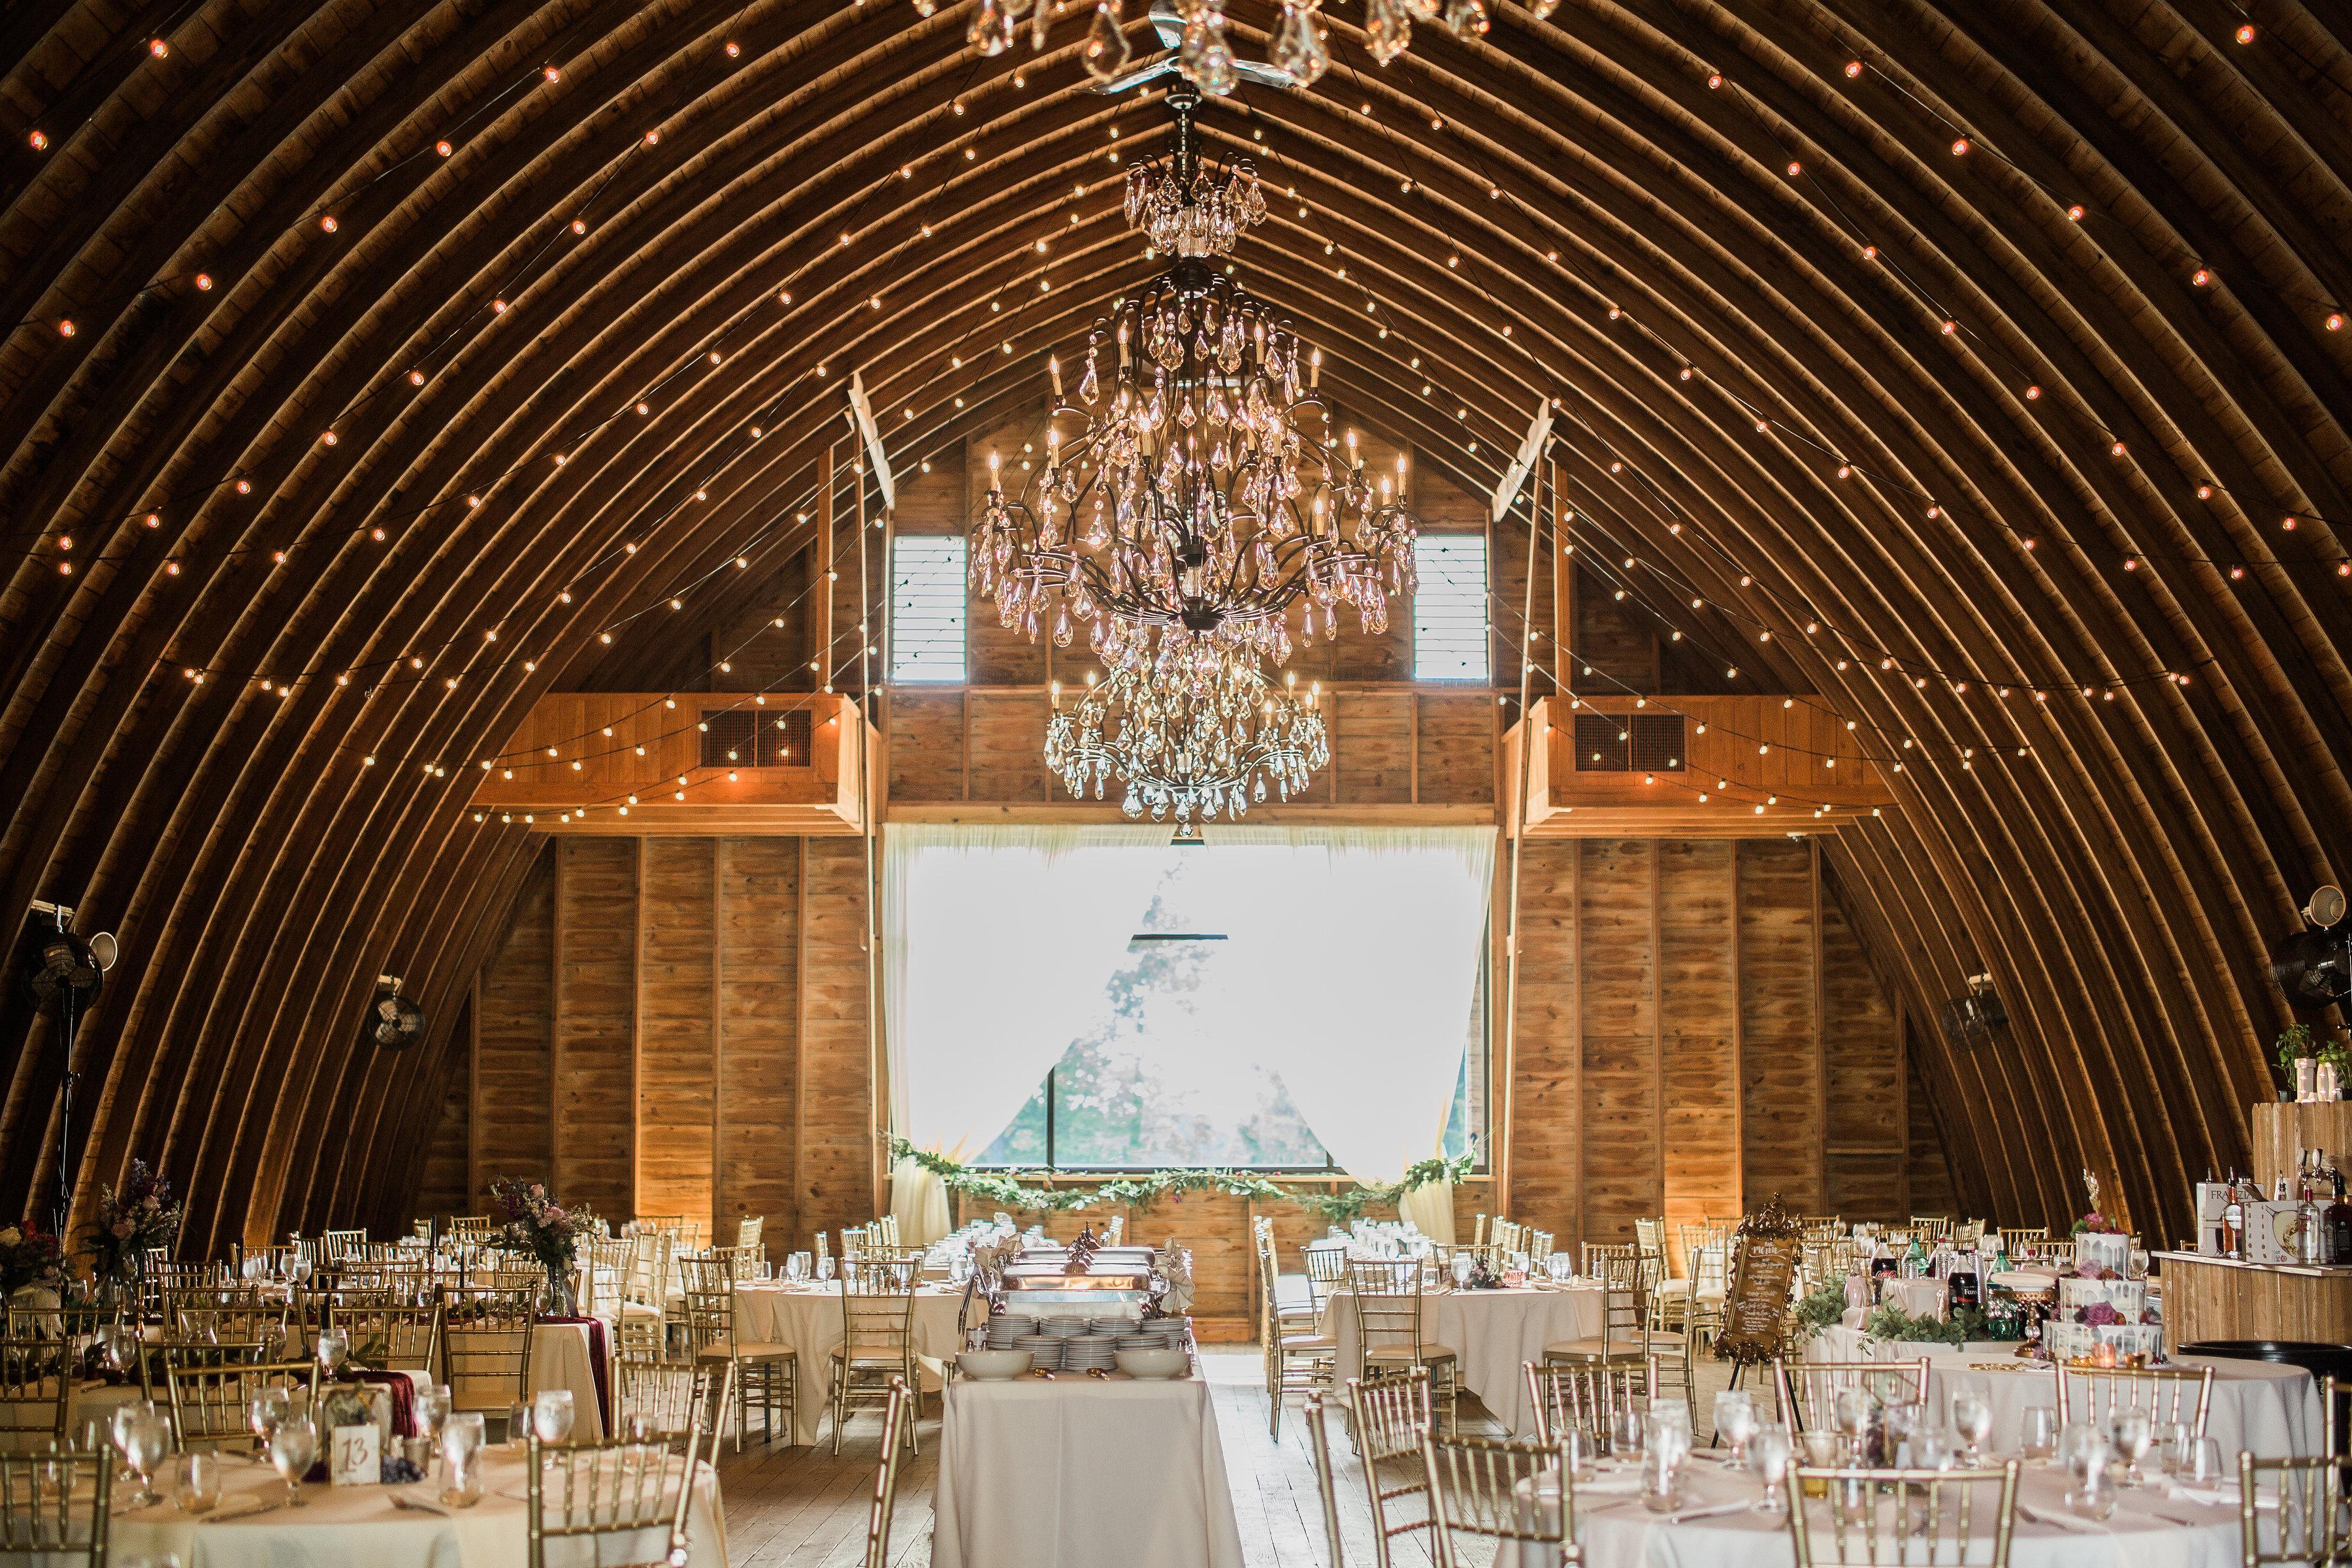 Irons Mill Farmstead Weddings Barn Wedding Venue New